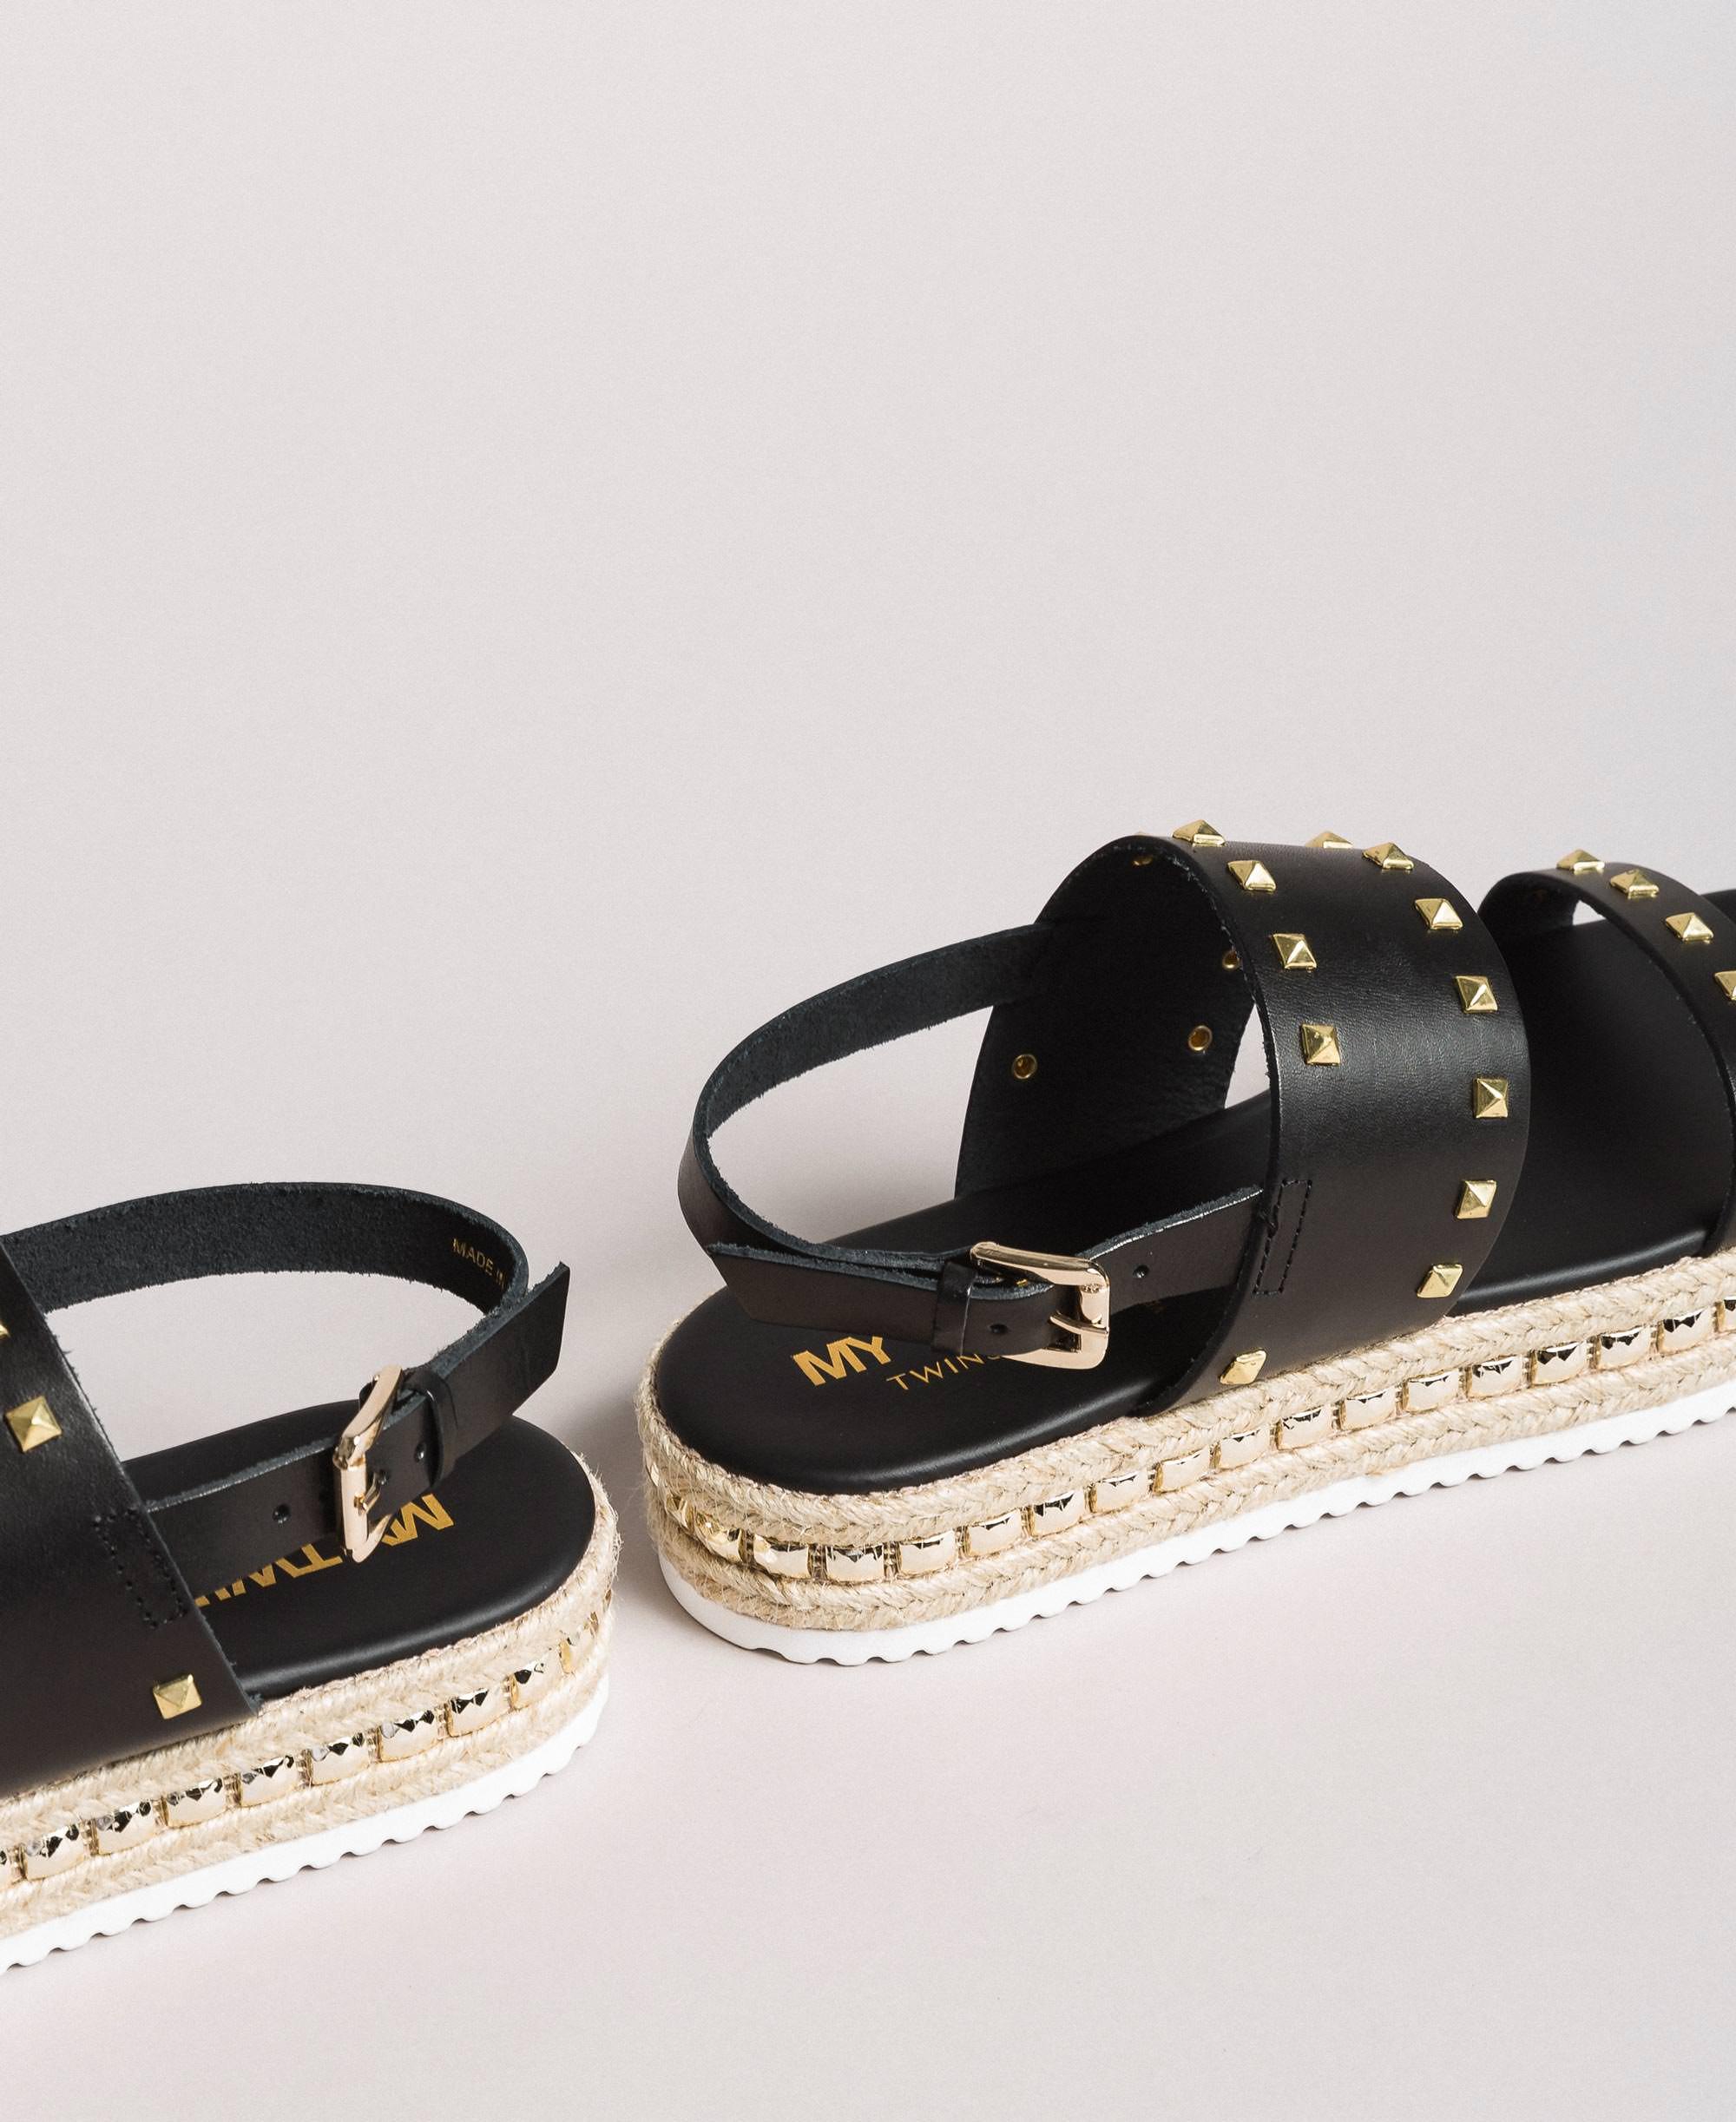 Platform sandals with studs